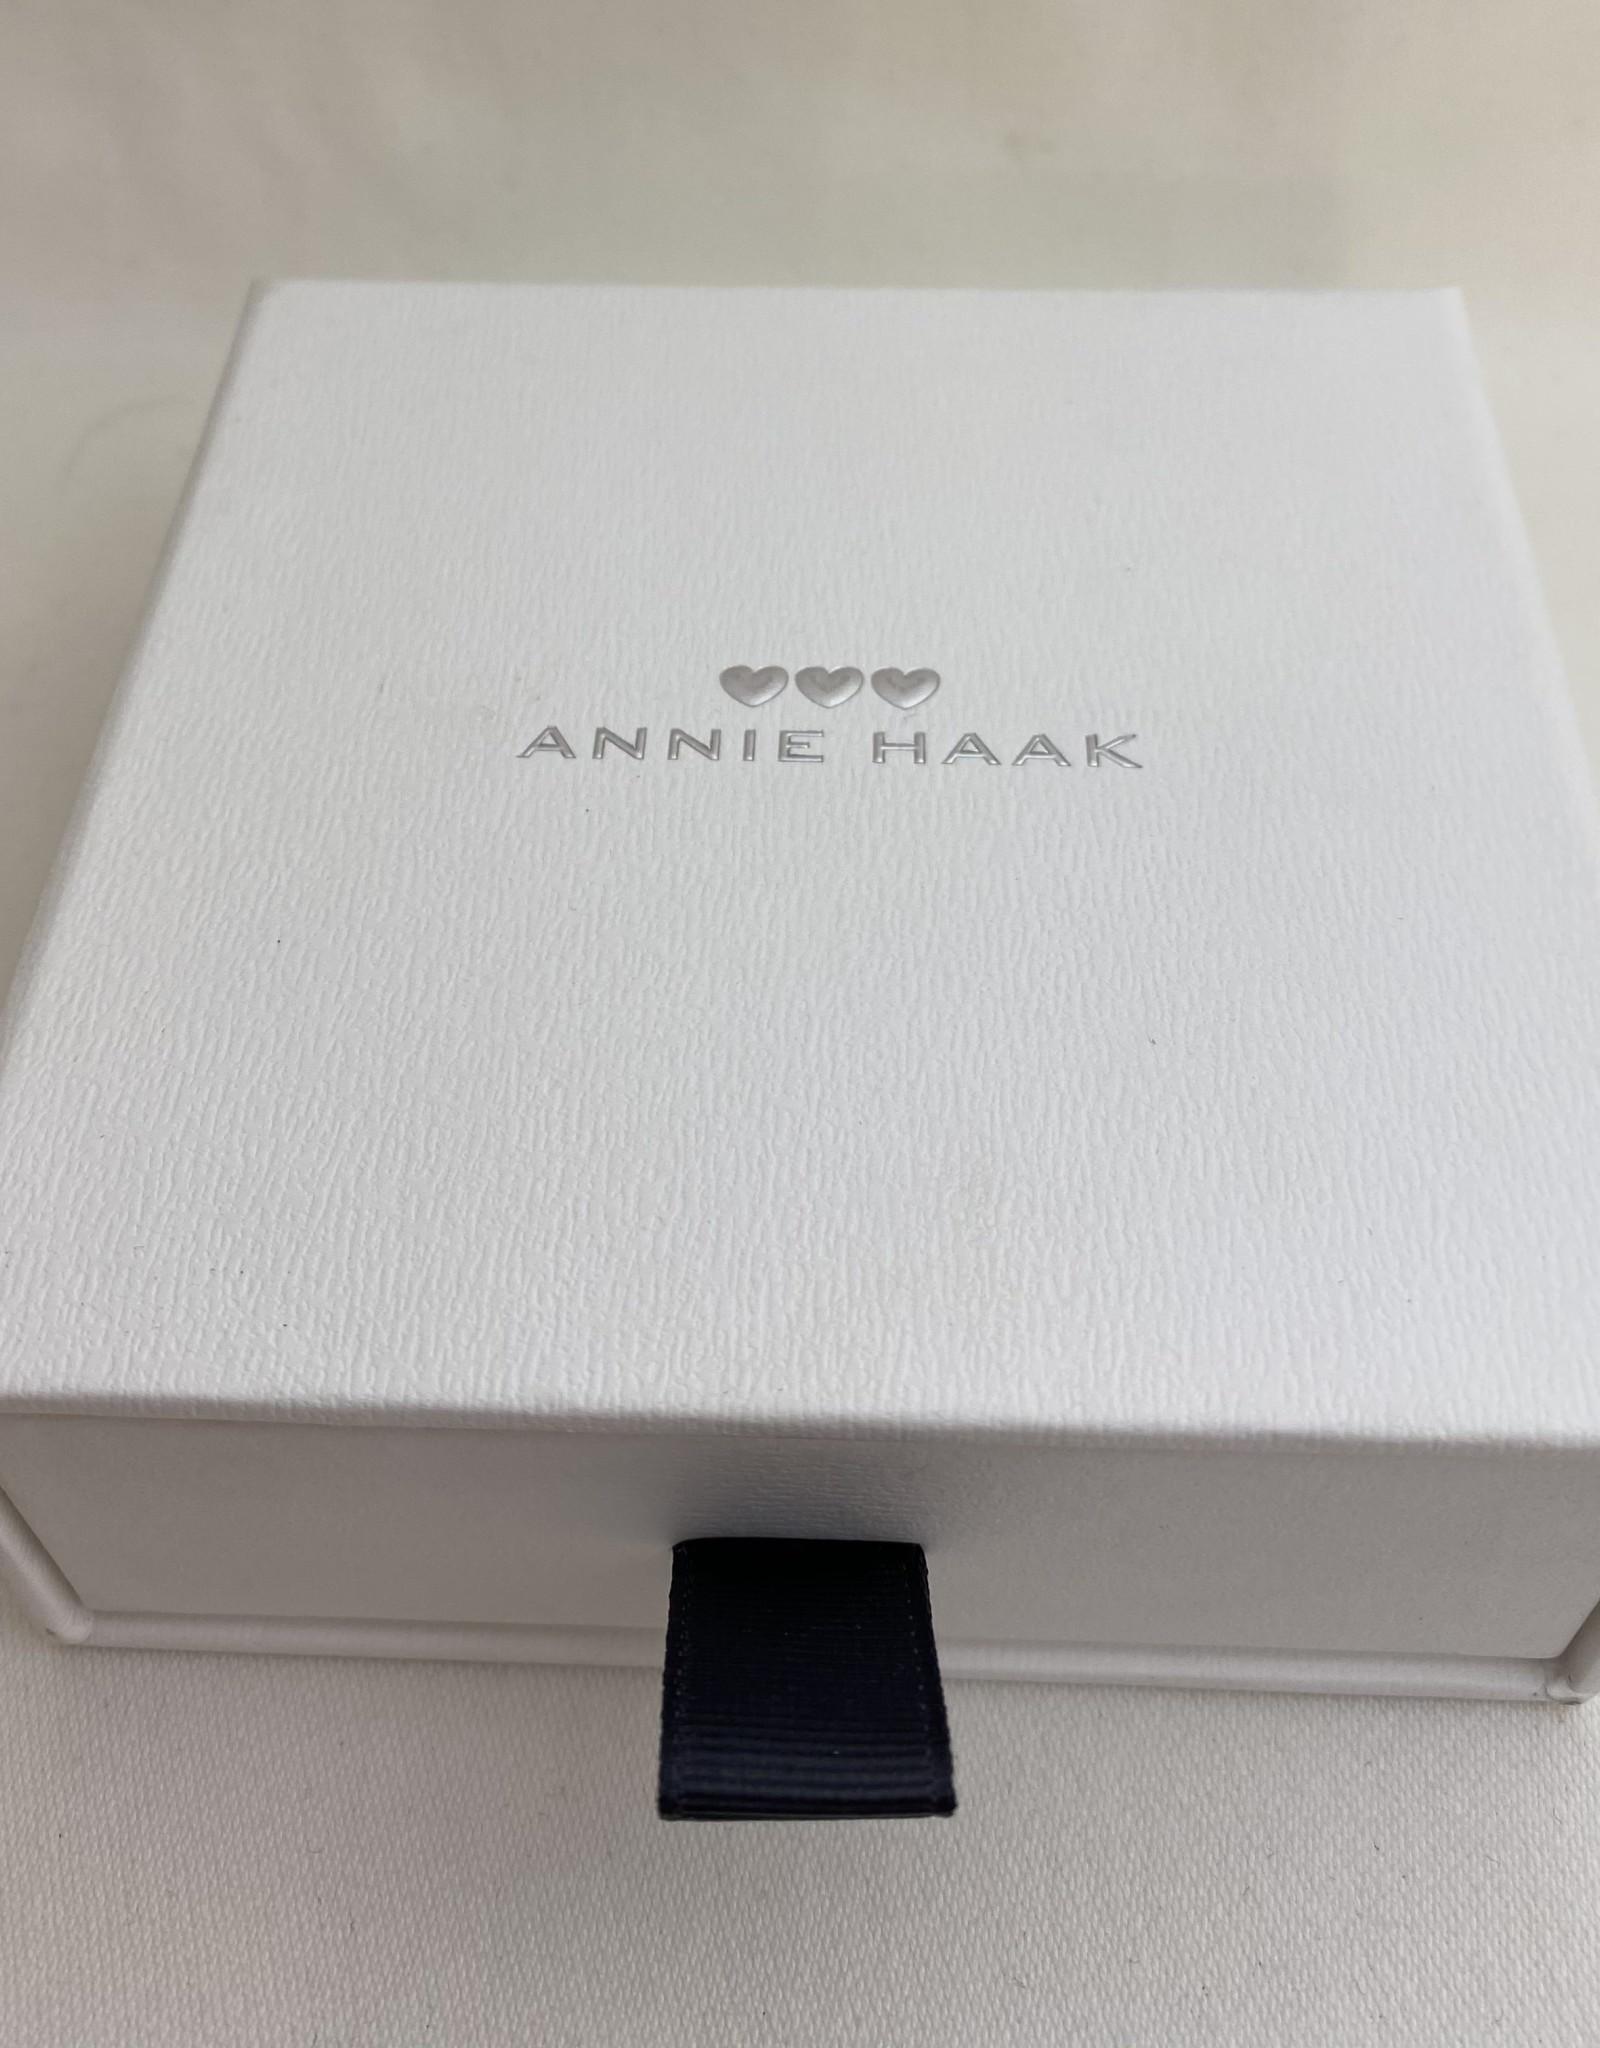 ANNIE HAAK YARD OF LOVE STERLING SILVER BRACELET FROM ANNIE HAAK